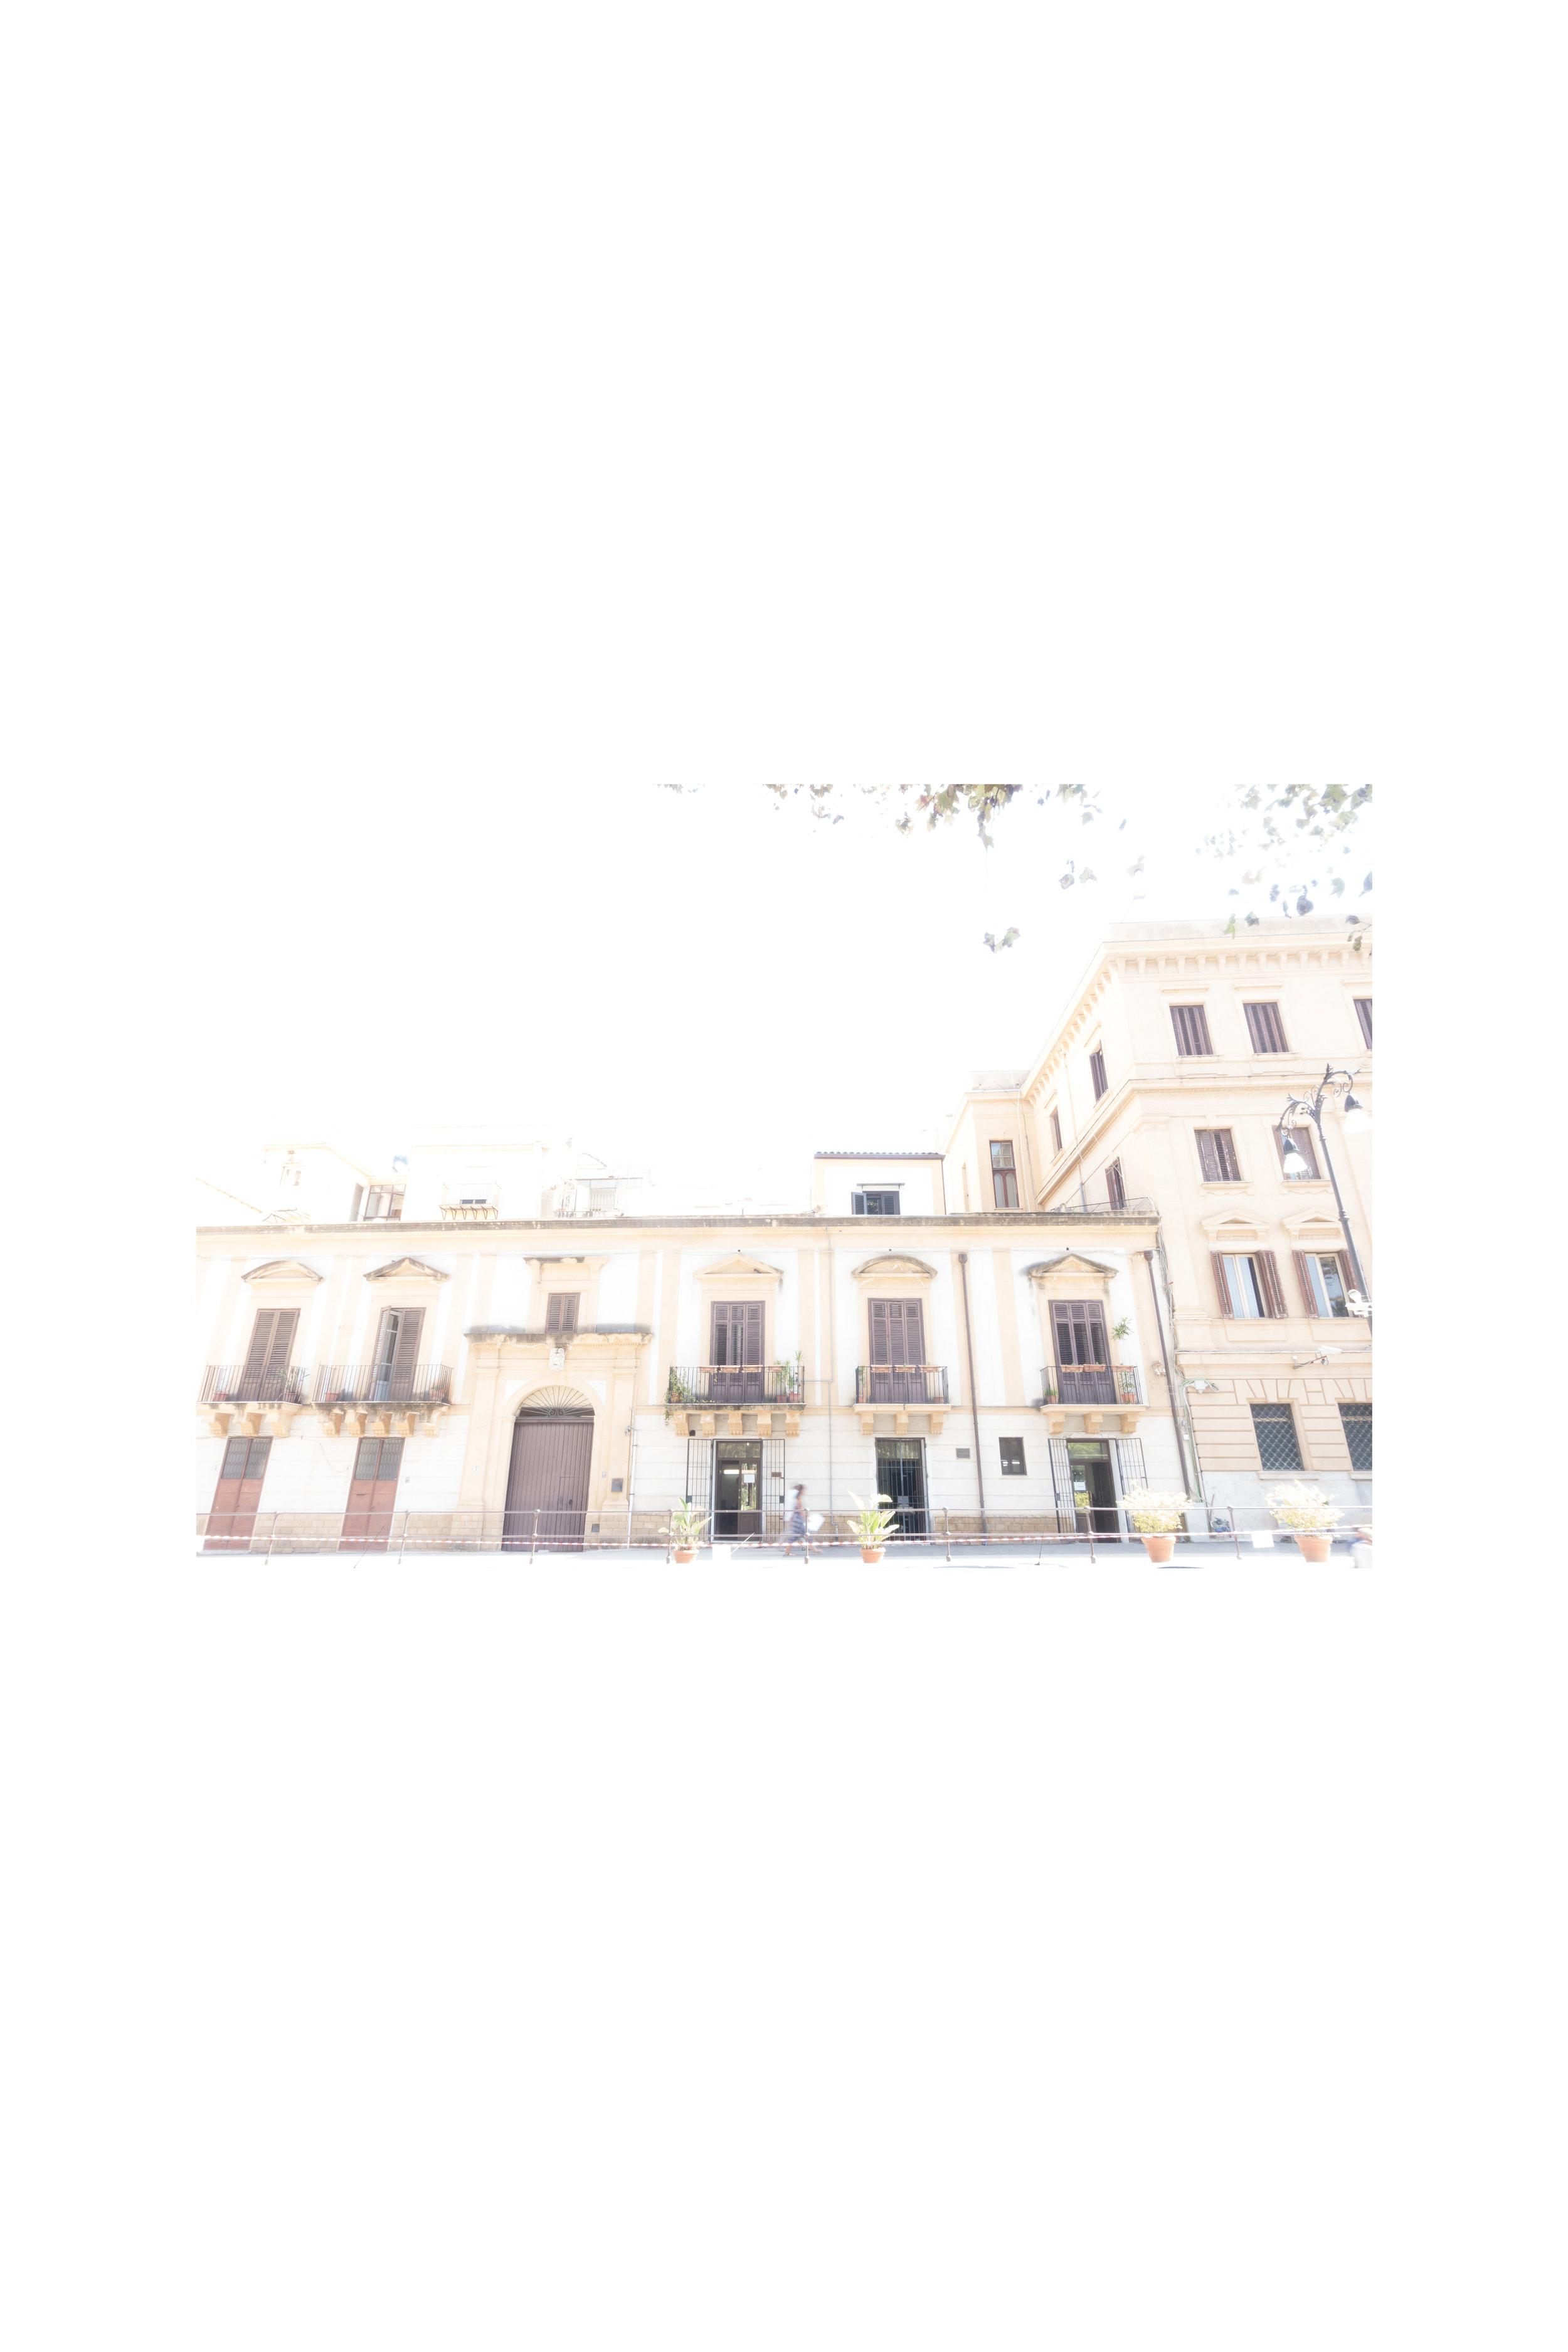 Luogo di nascita, Piazza della Vittoria 8-foto su carta Titanium32x48cm.jpg